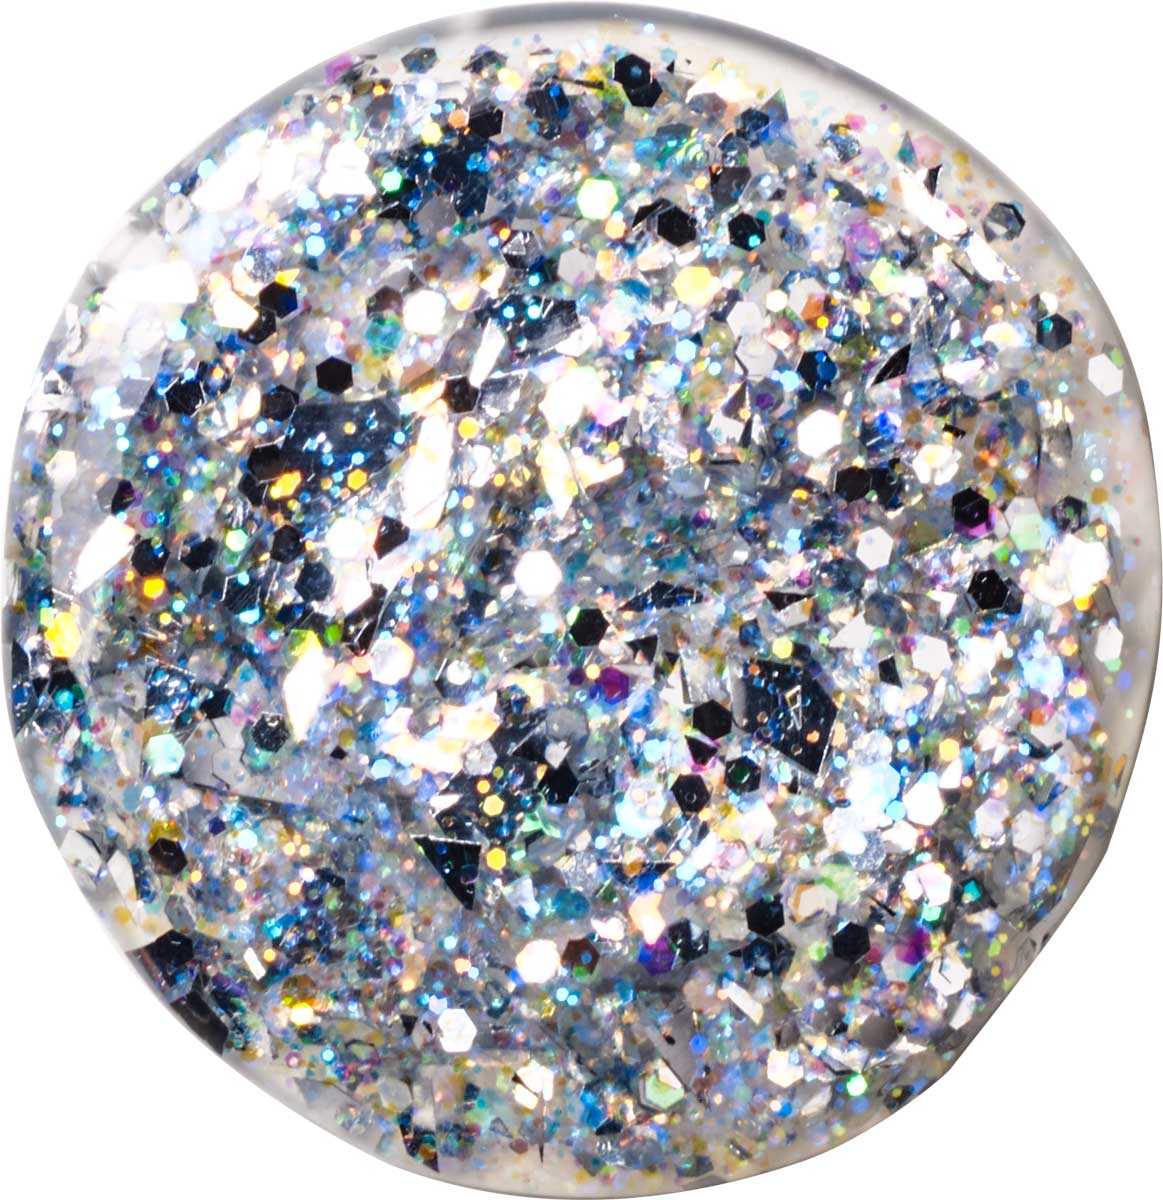 FolkArt ® Glitterific™ Acrylic Paint - Silver, 2 oz.